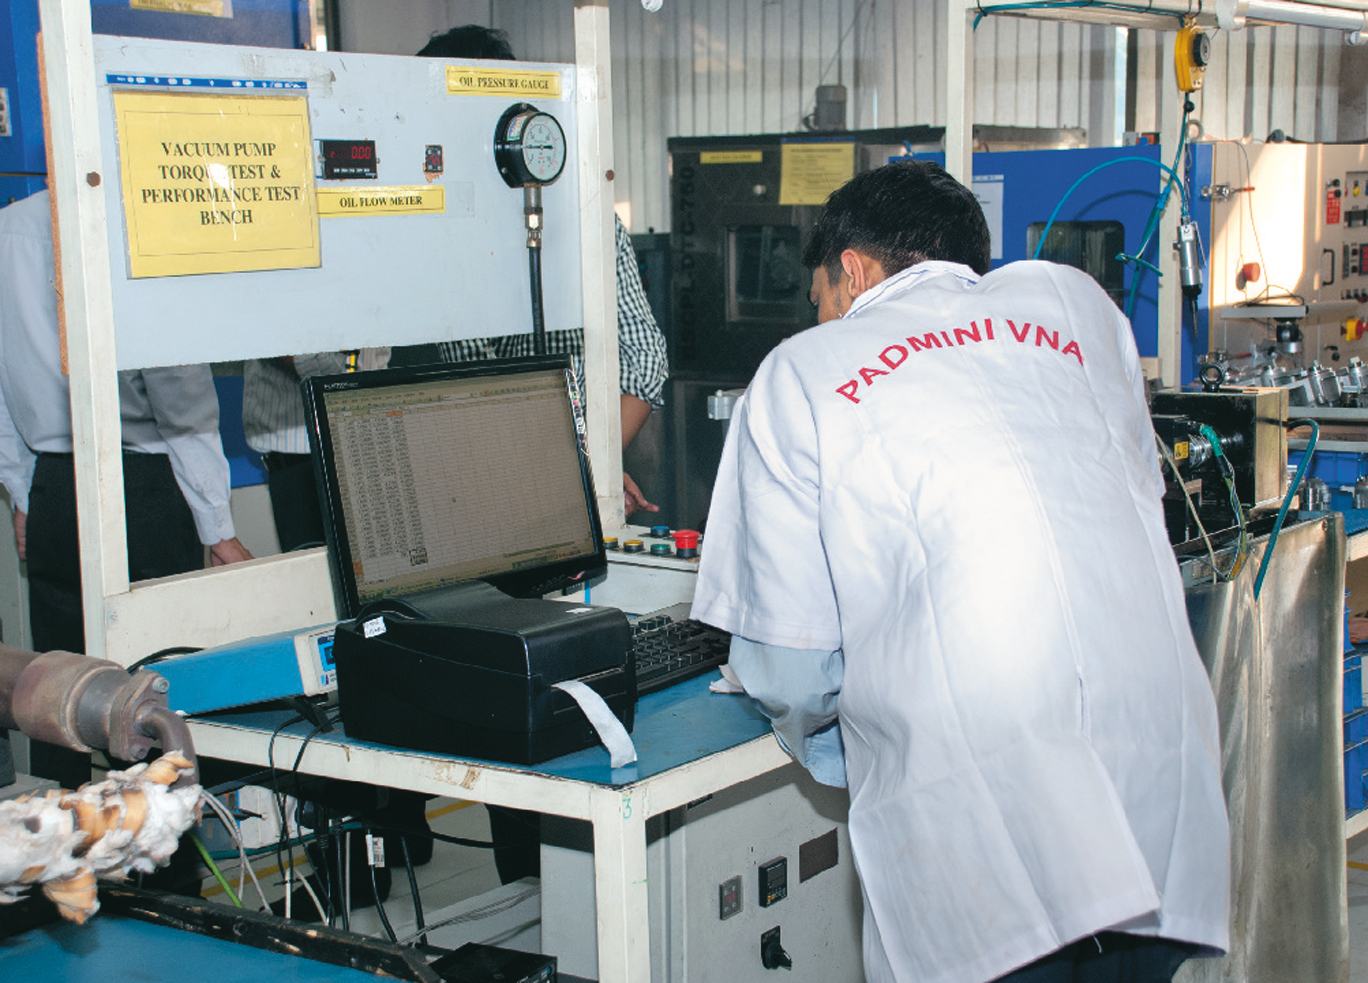 Padmini VNA Mechatronics Local Tech, Global Ambitions